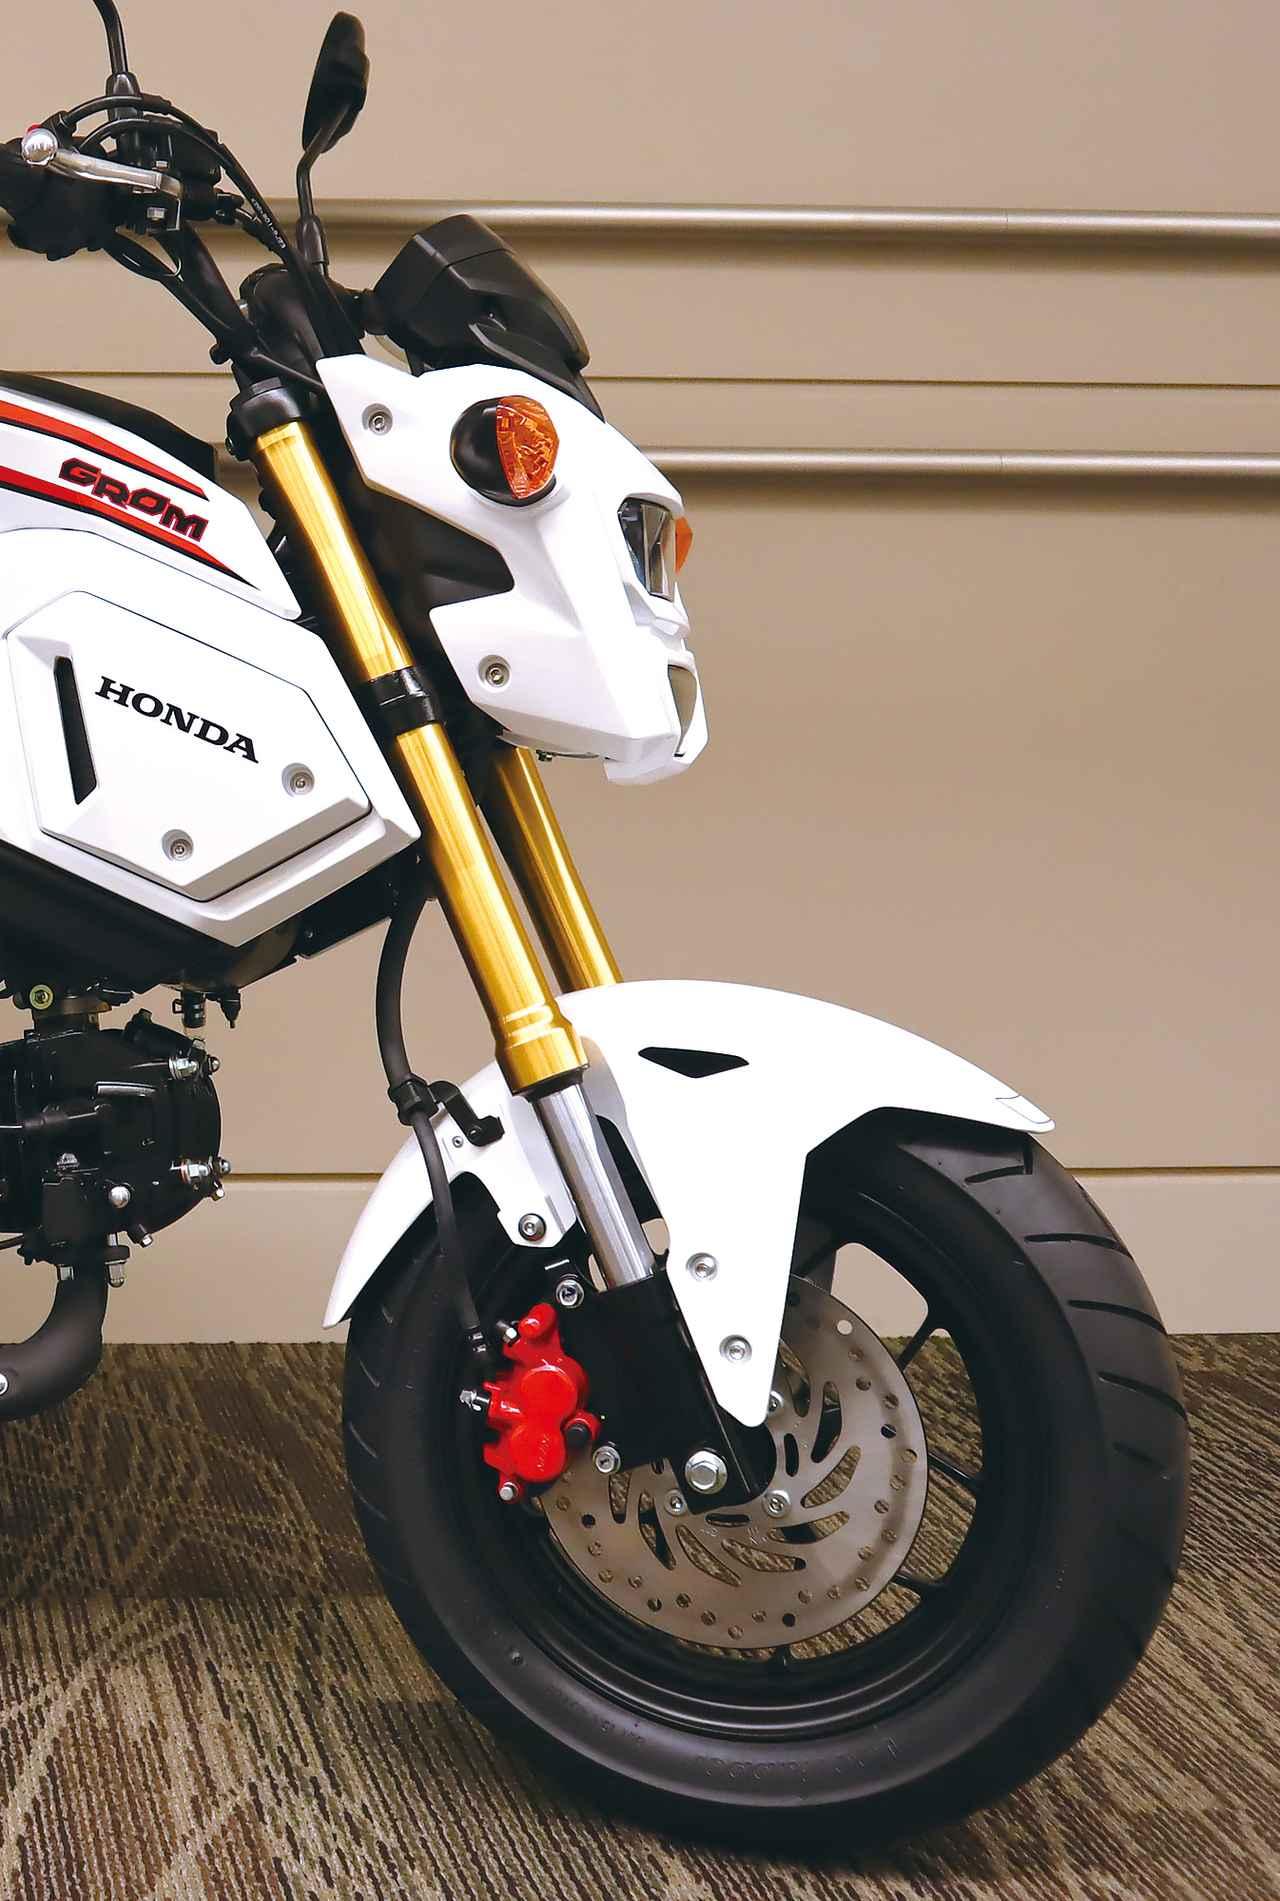 Images : 3番目の画像 - 「GROM」ホワイト(市販予定車)2020年ニューカラーの写真をもっと見る - webオートバイ